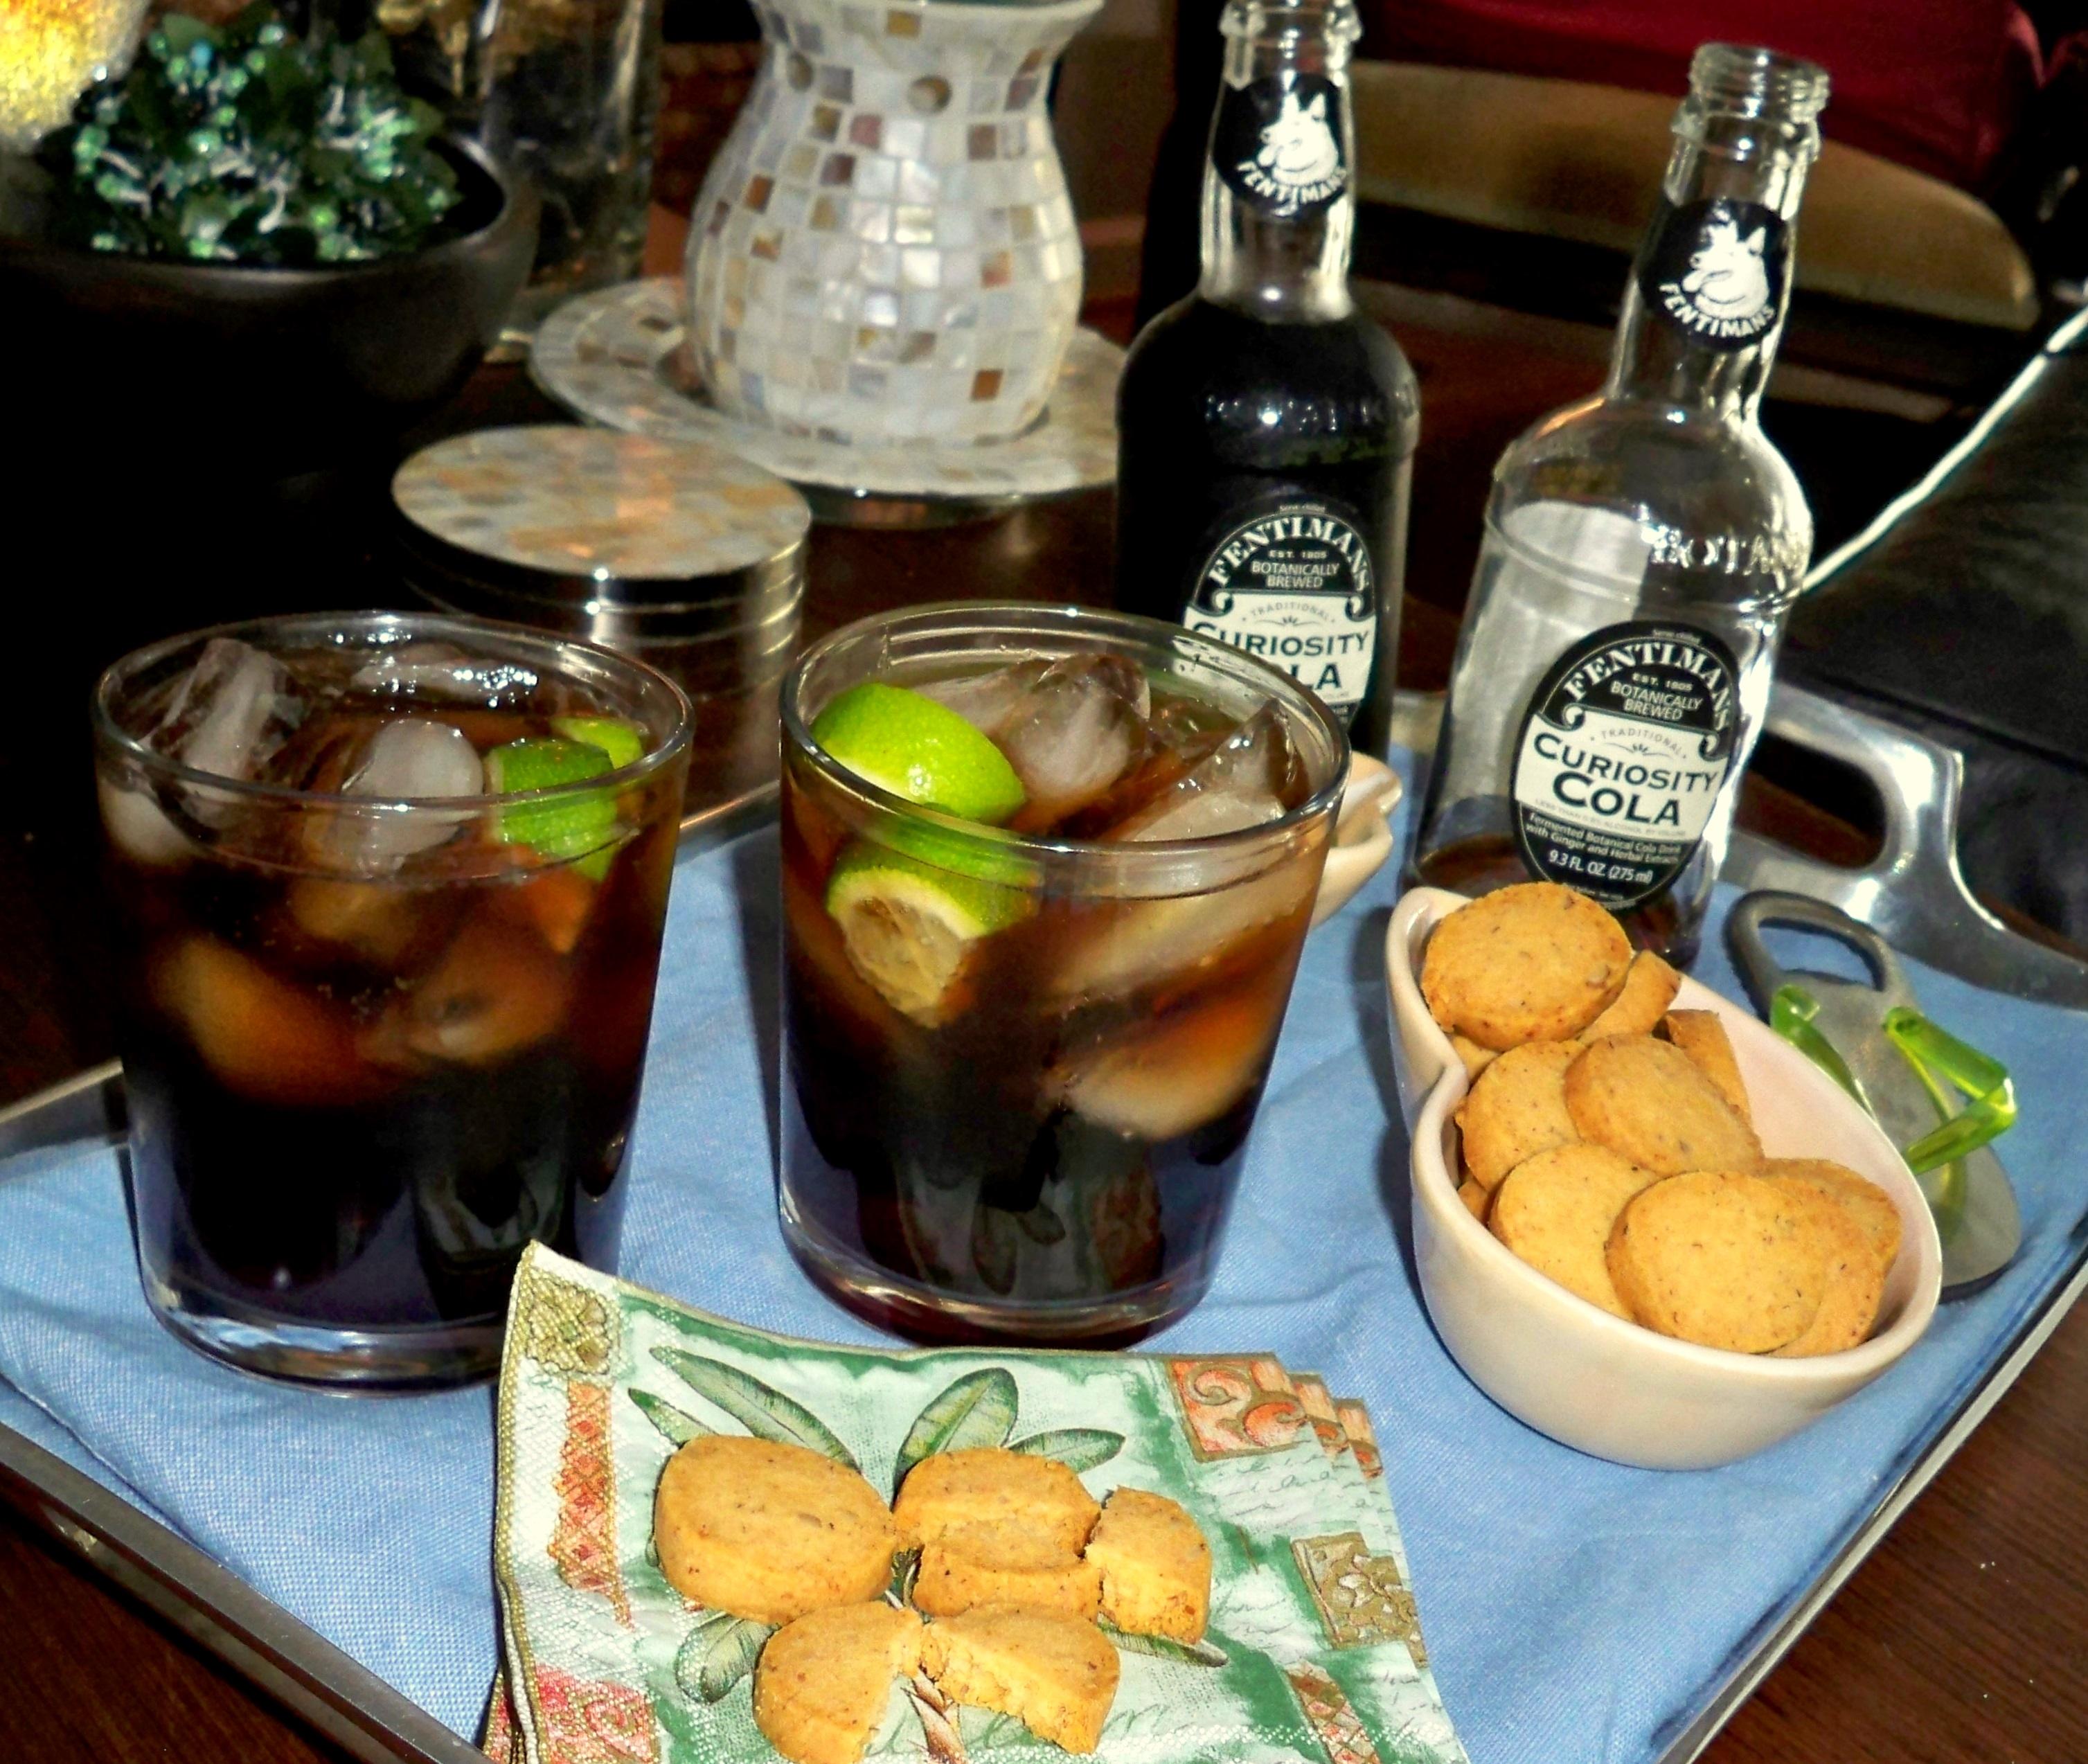 cocktail hour rewards